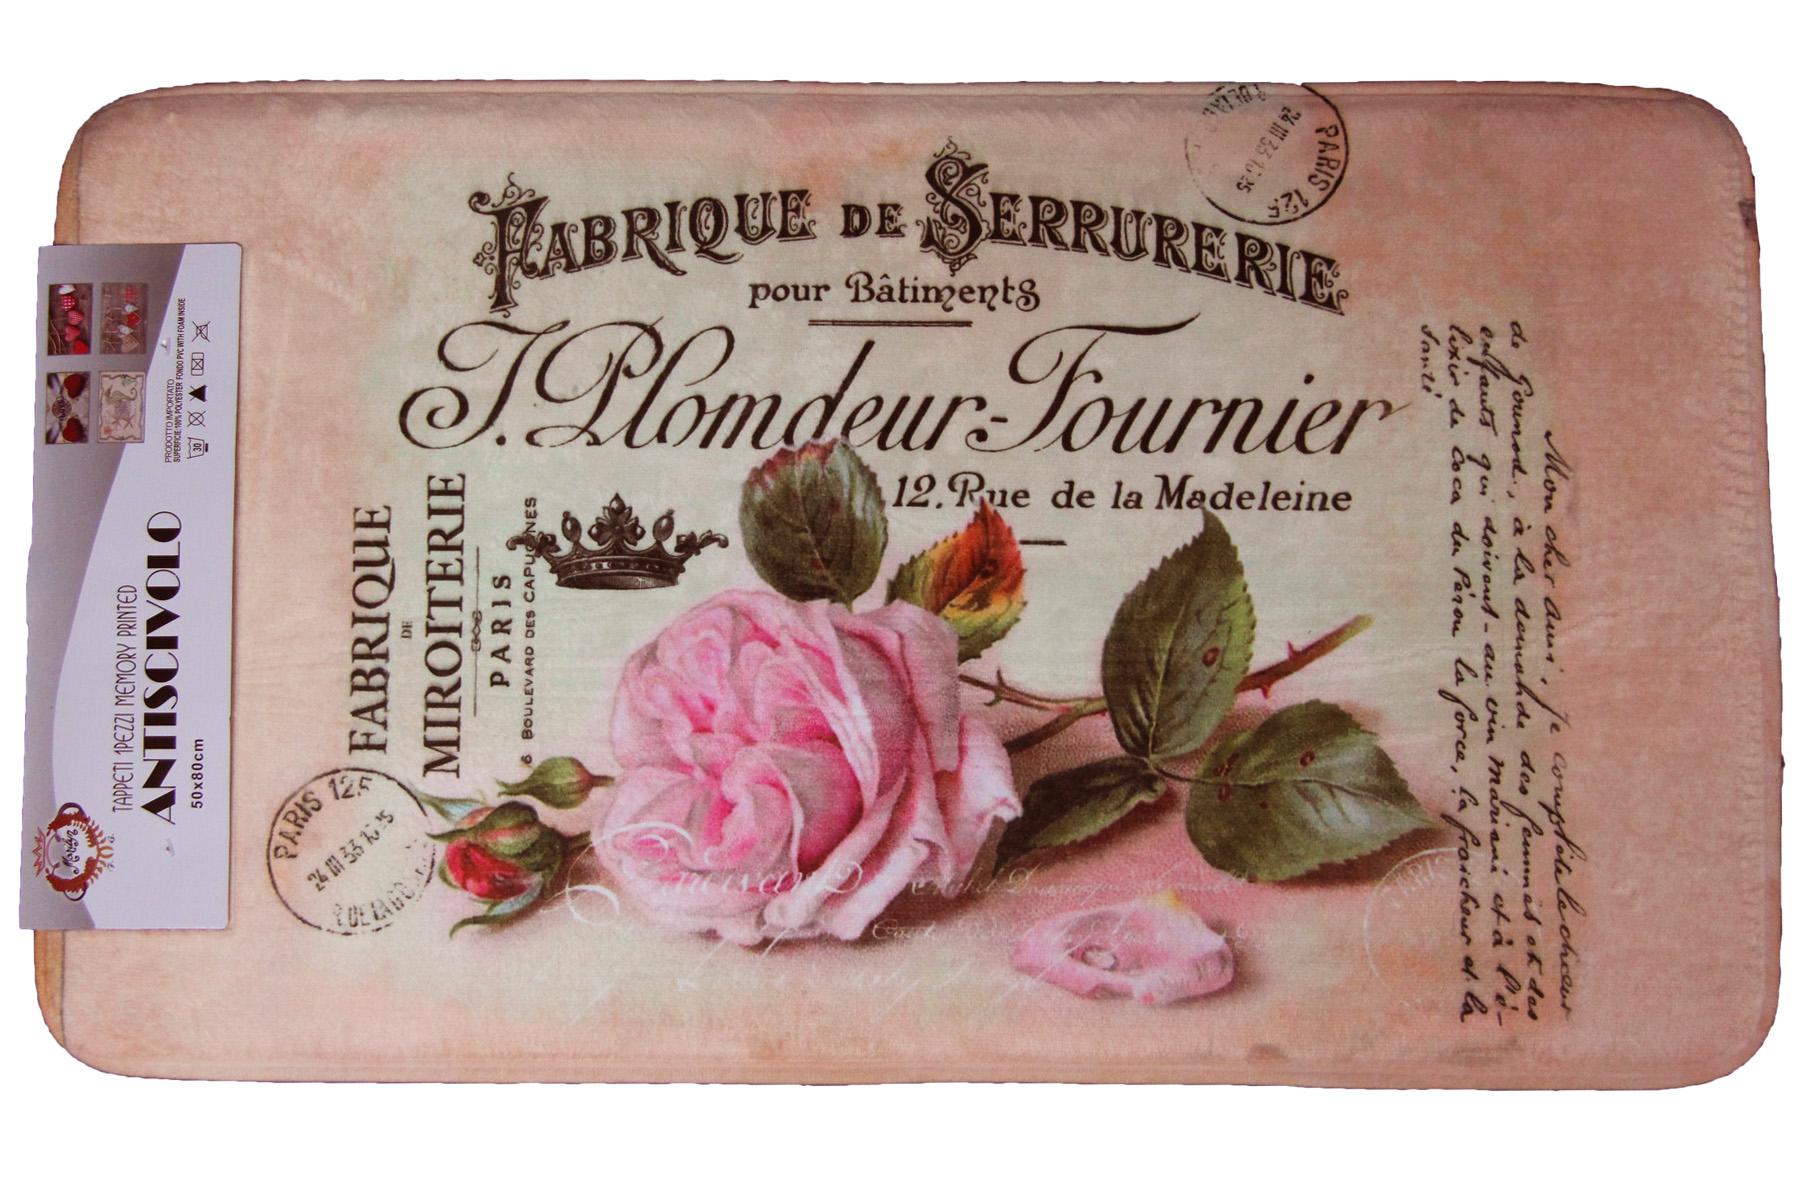 Tappetino tappeto tris bagno 3d marilyn antiscivolo pvc stampa rose salmone rosa ebay - Tris tappeti bagno ...